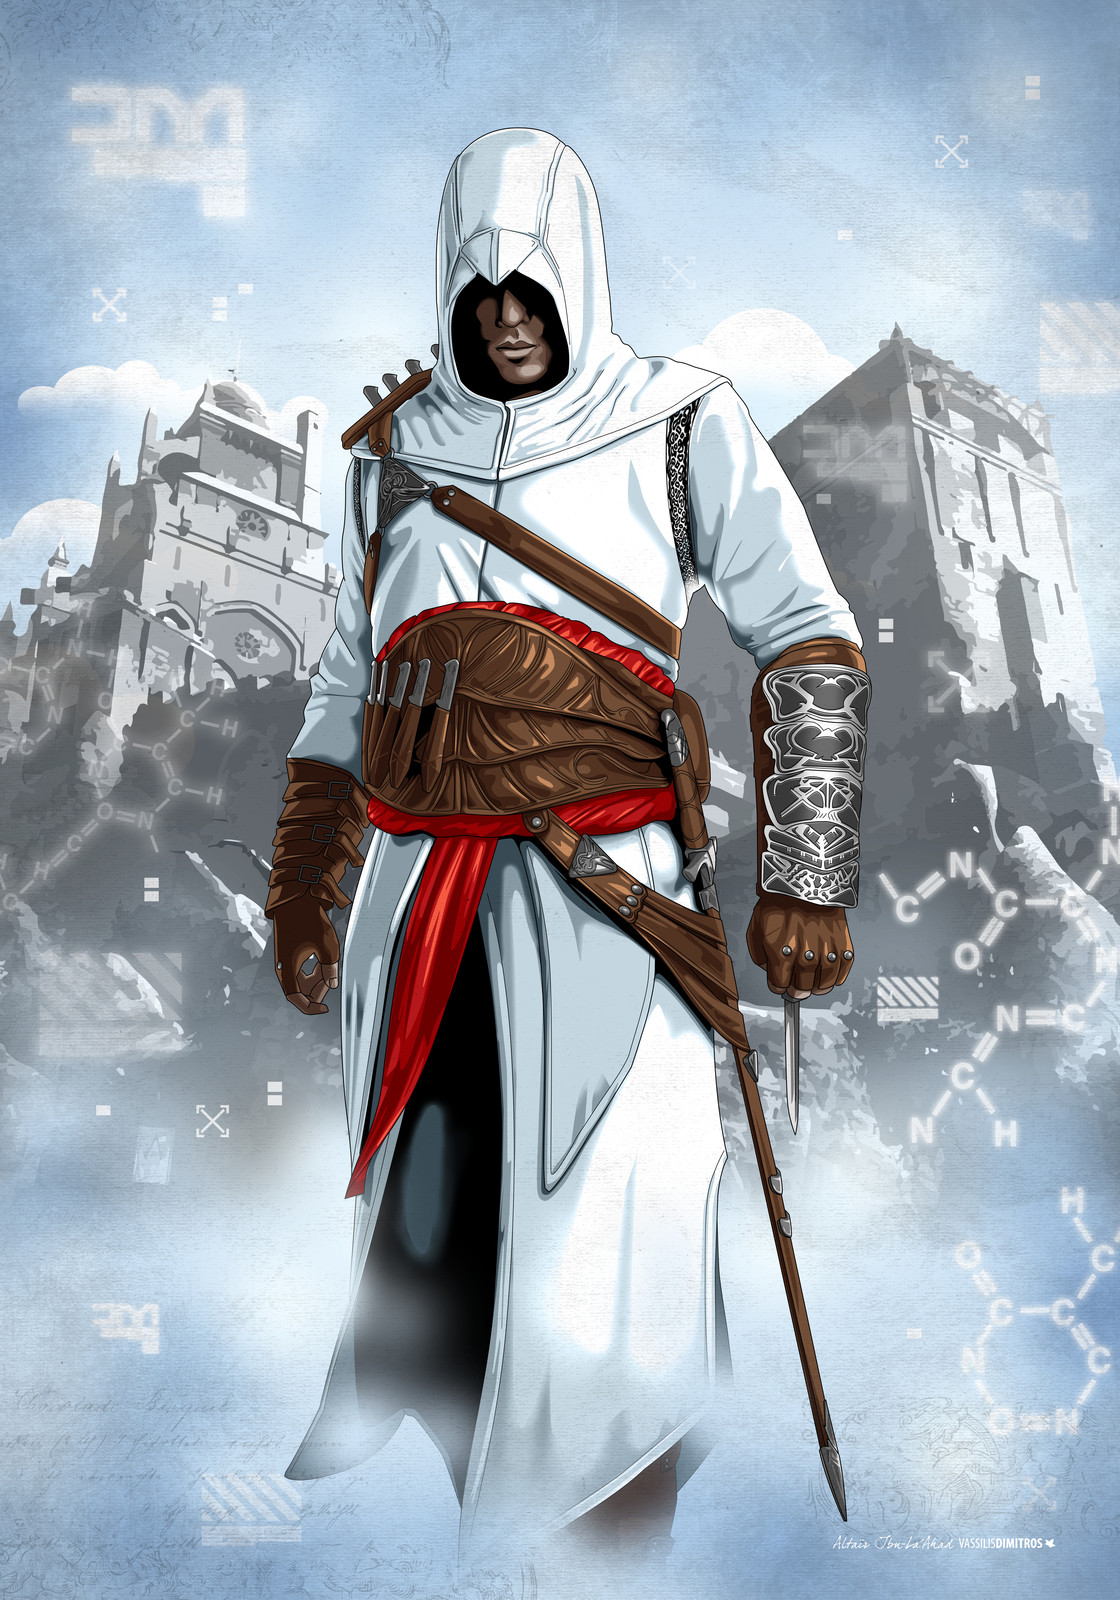 Altair Ibn La'Ahad (Masyaf 1189)